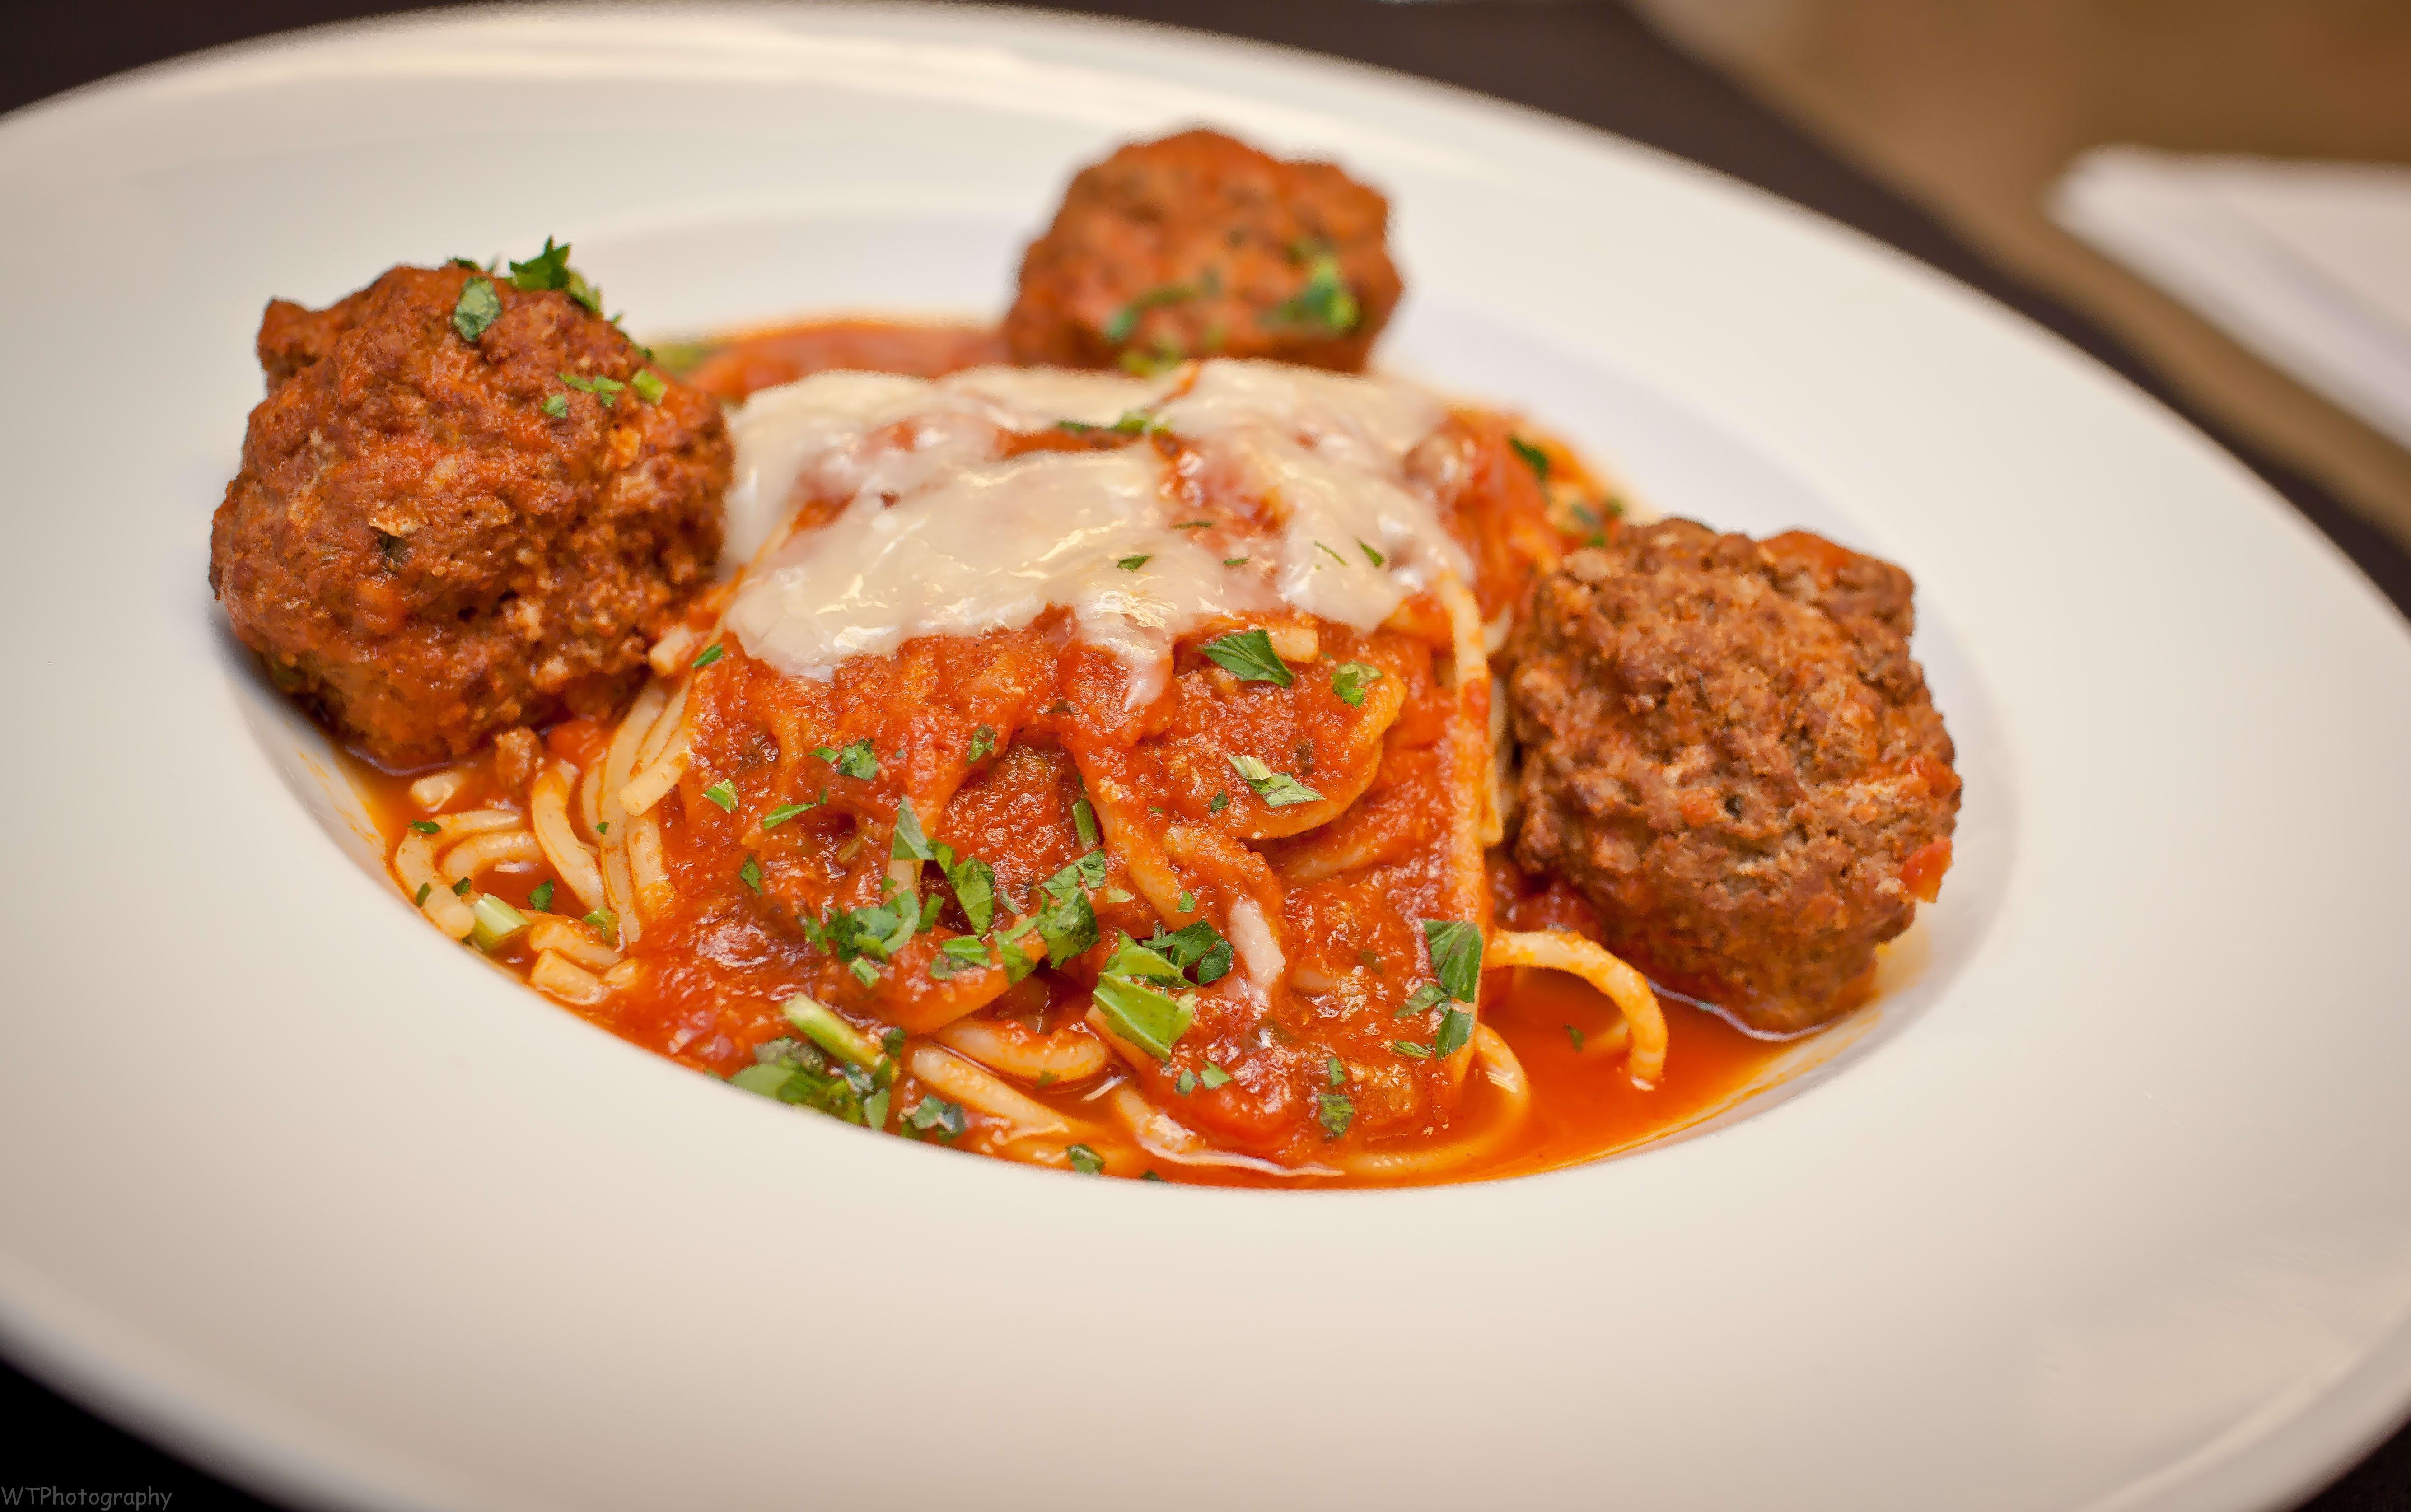 Spaghetti with Meatballs at TusCa